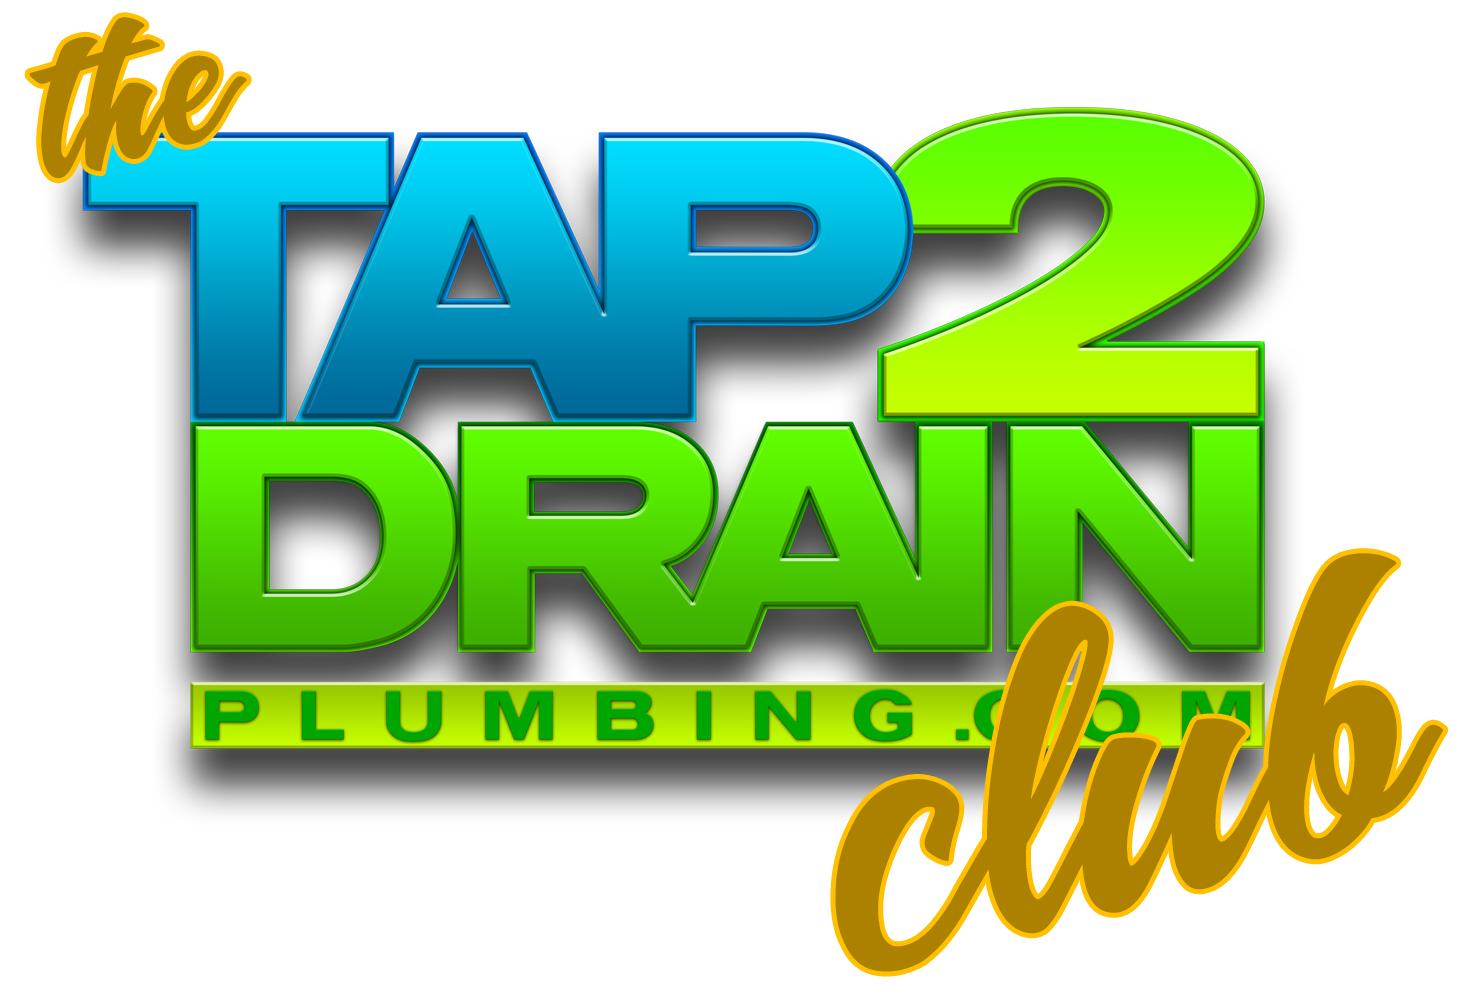 plumbing mission